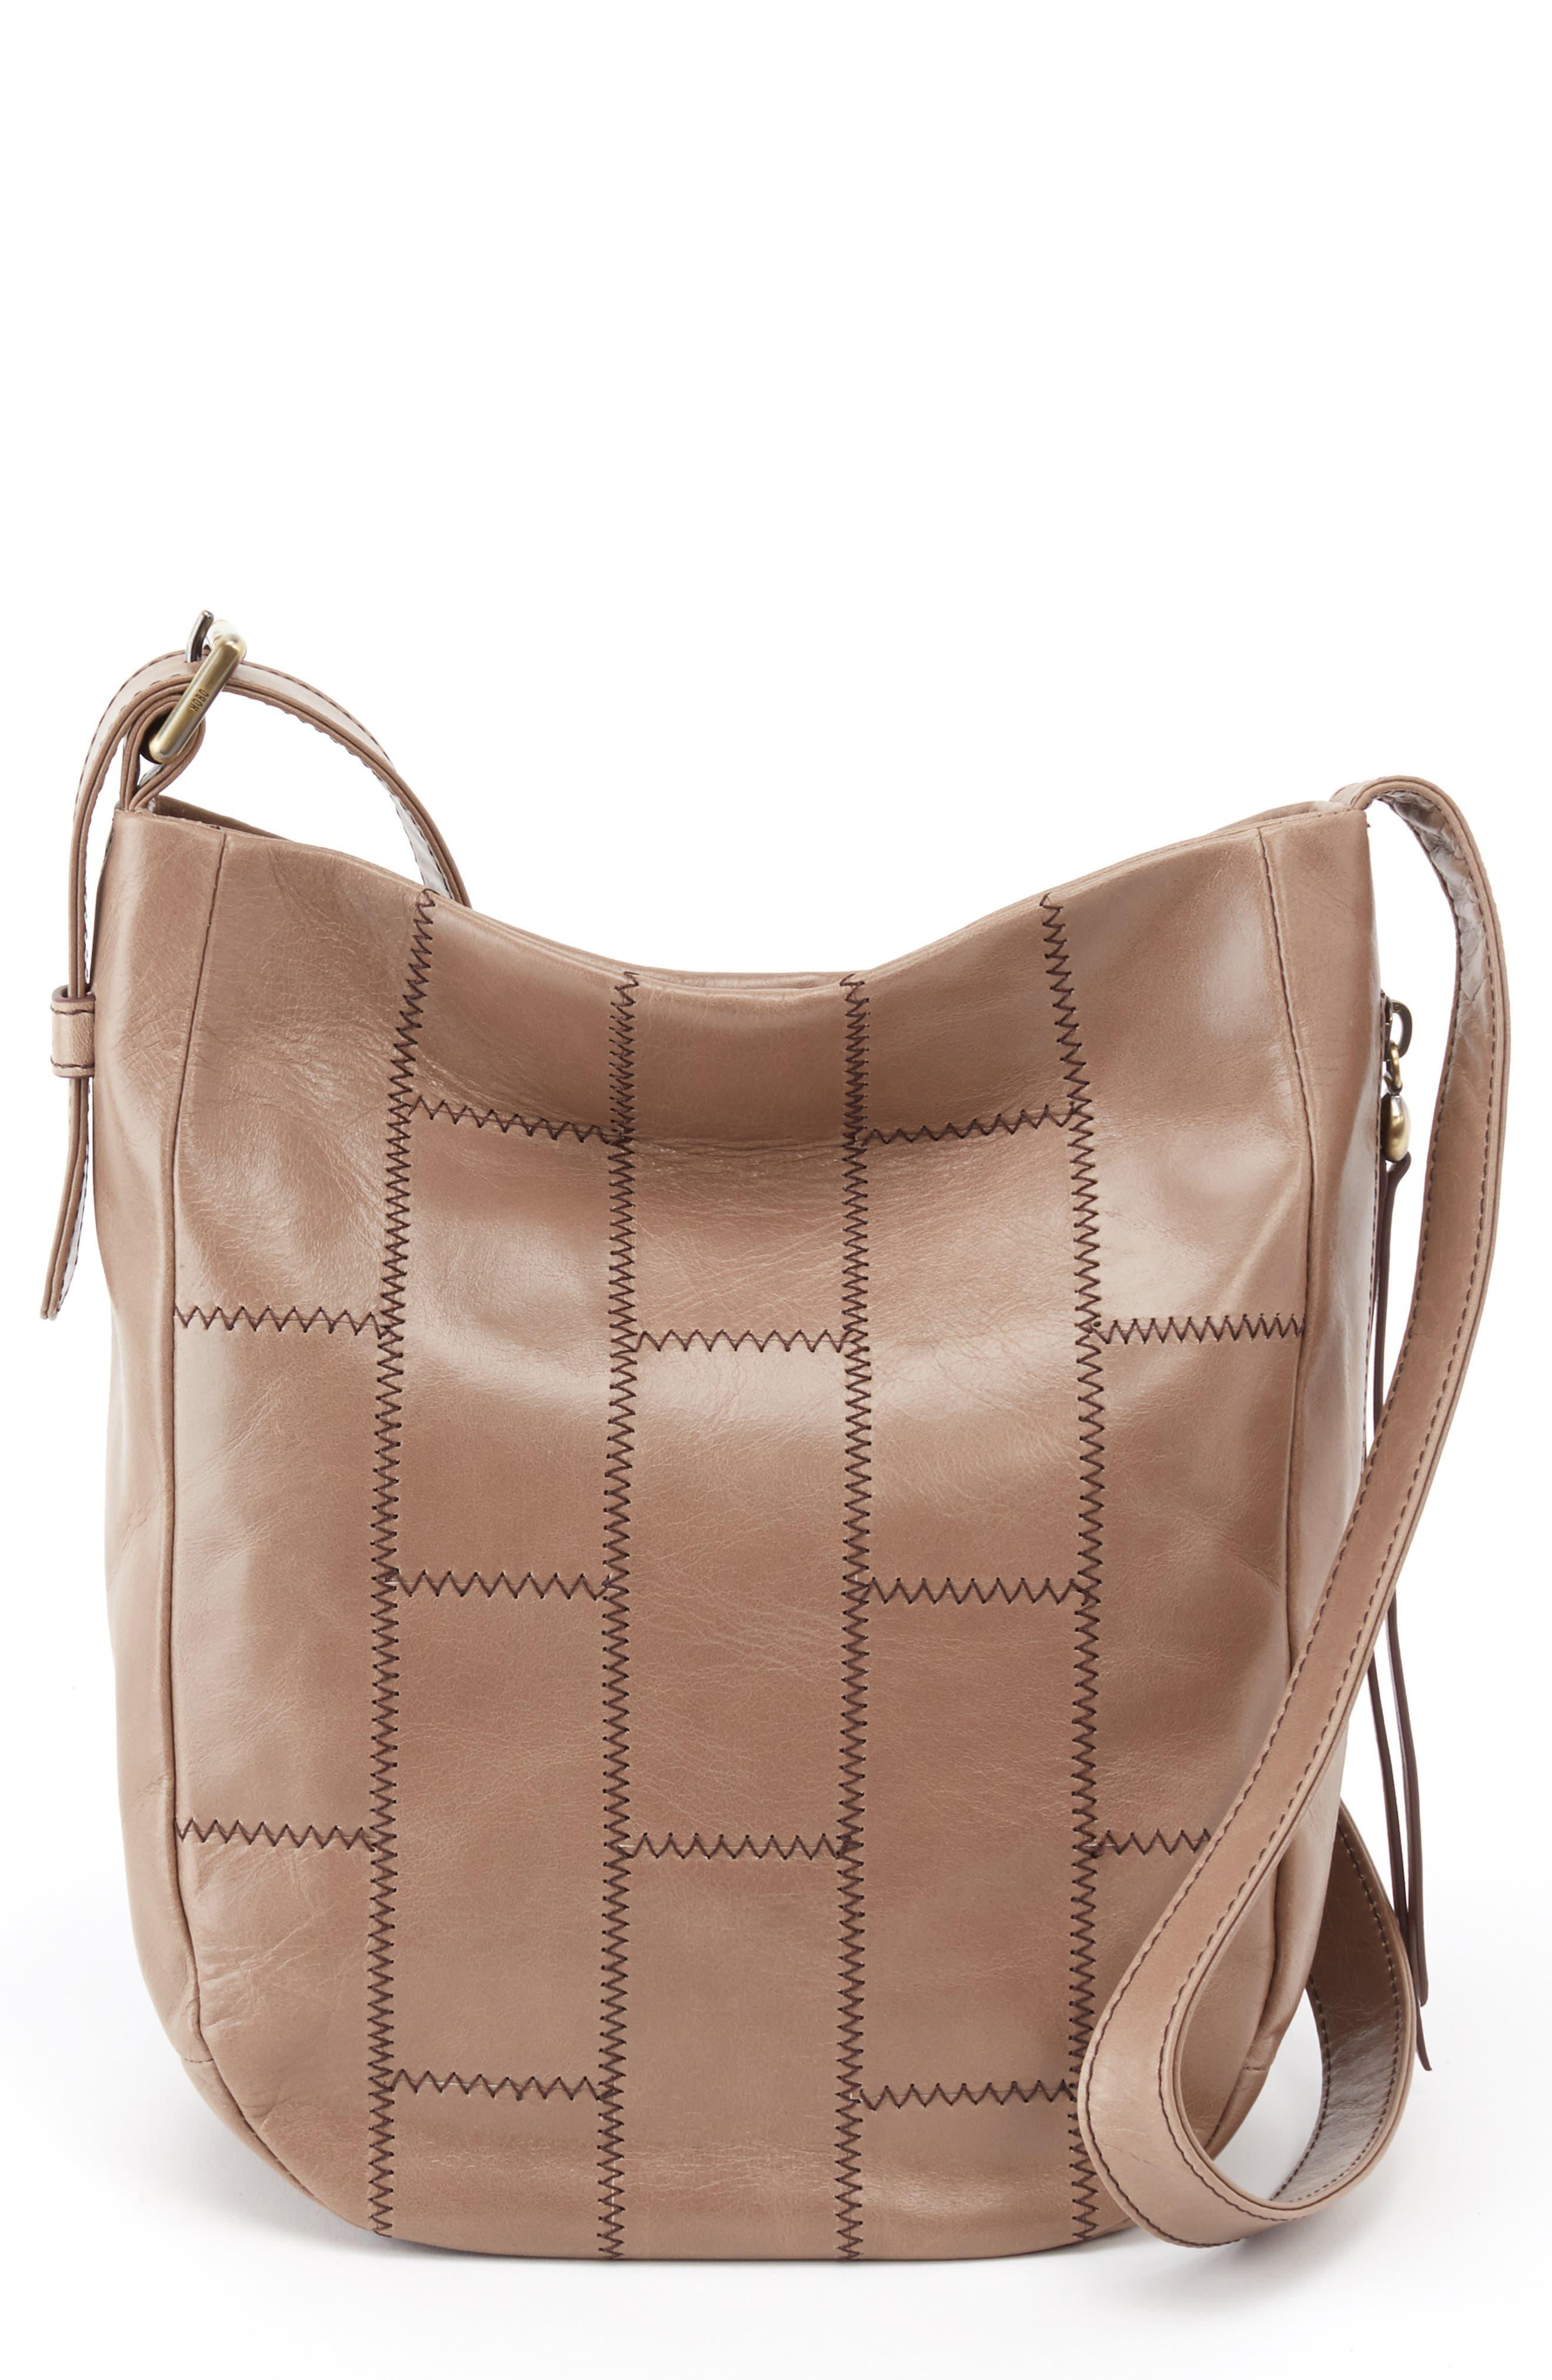 HOBO,                             Kharma Patchwork Calfskin Leather Bucket Bag,                             Main thumbnail 1, color,                             COBBLESTONE